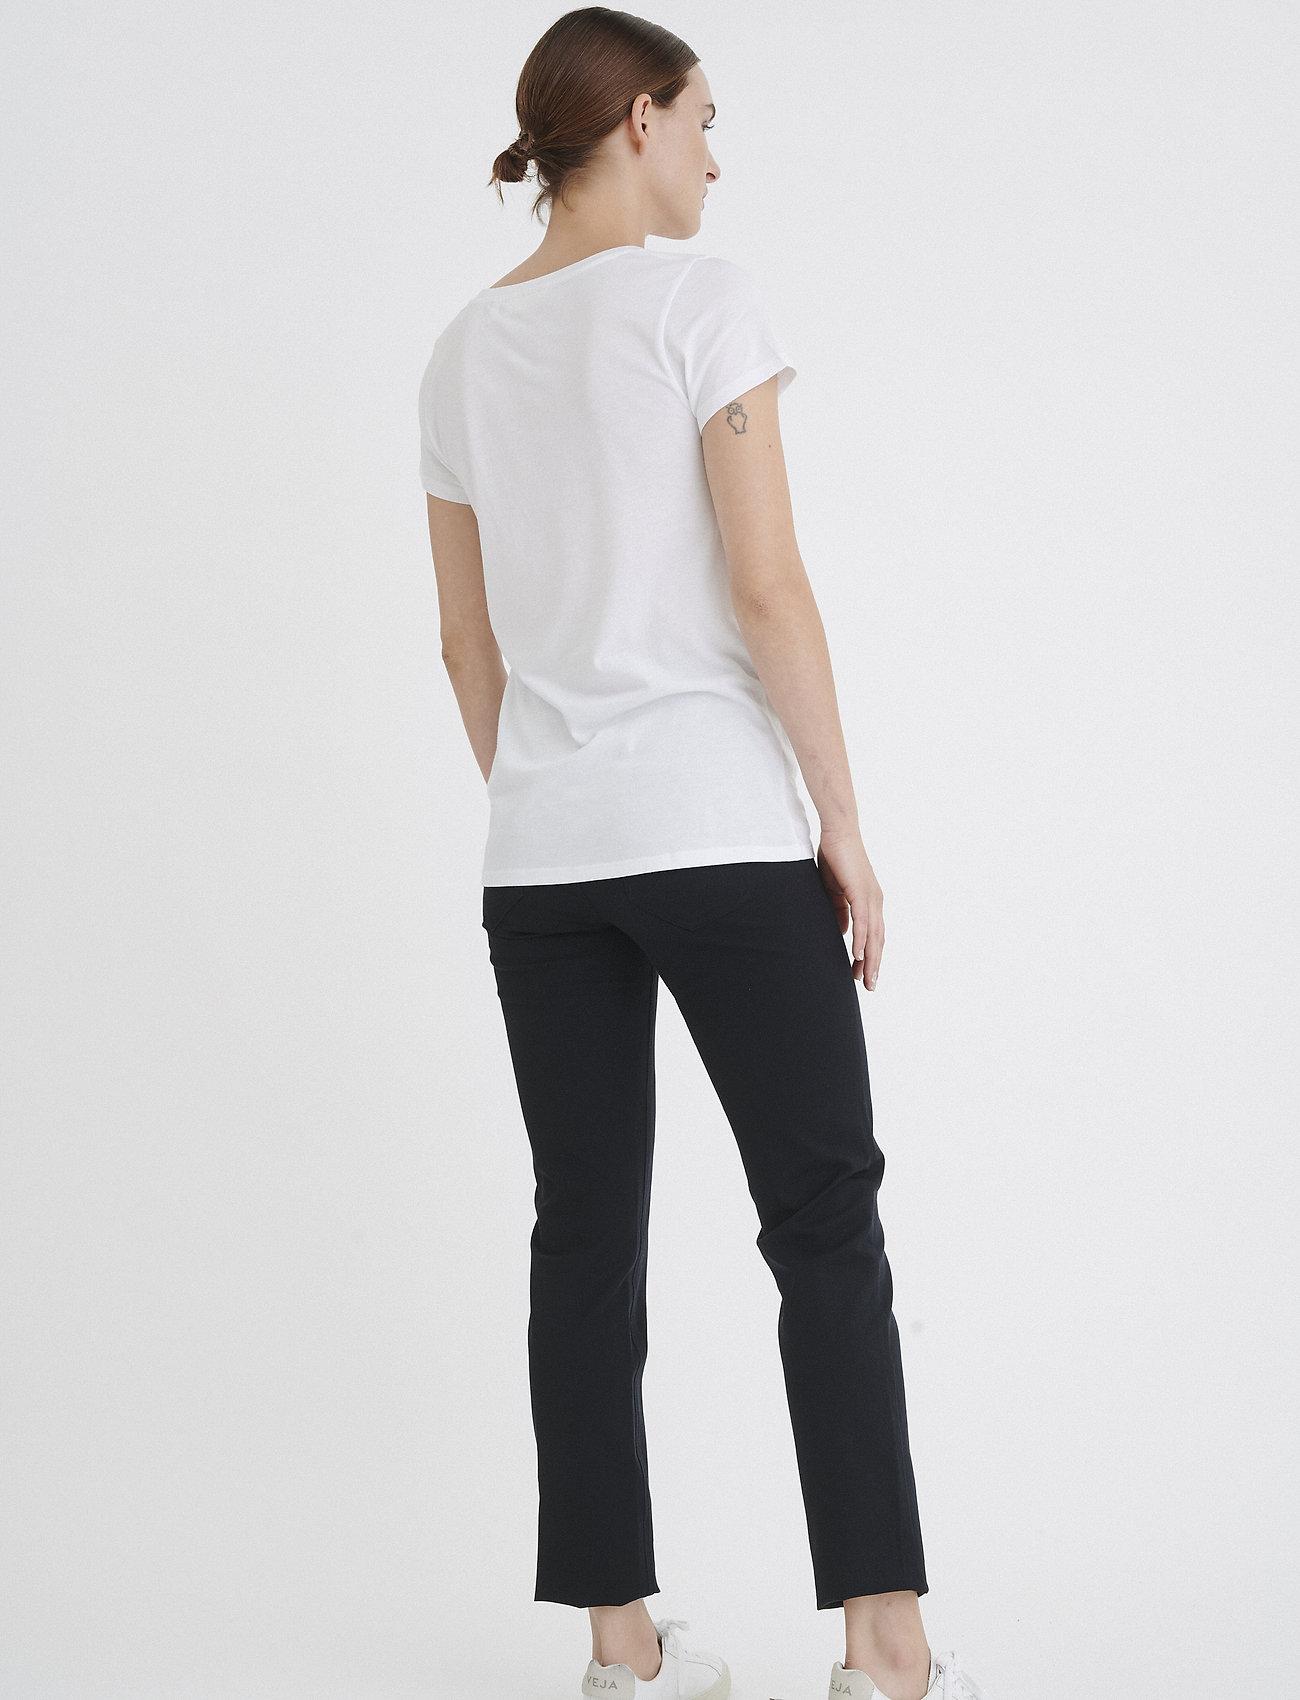 InWear Rena V Tshirt KNTG - T-shirts & topper PURE WHITE - Dameklær Spesialtilbud